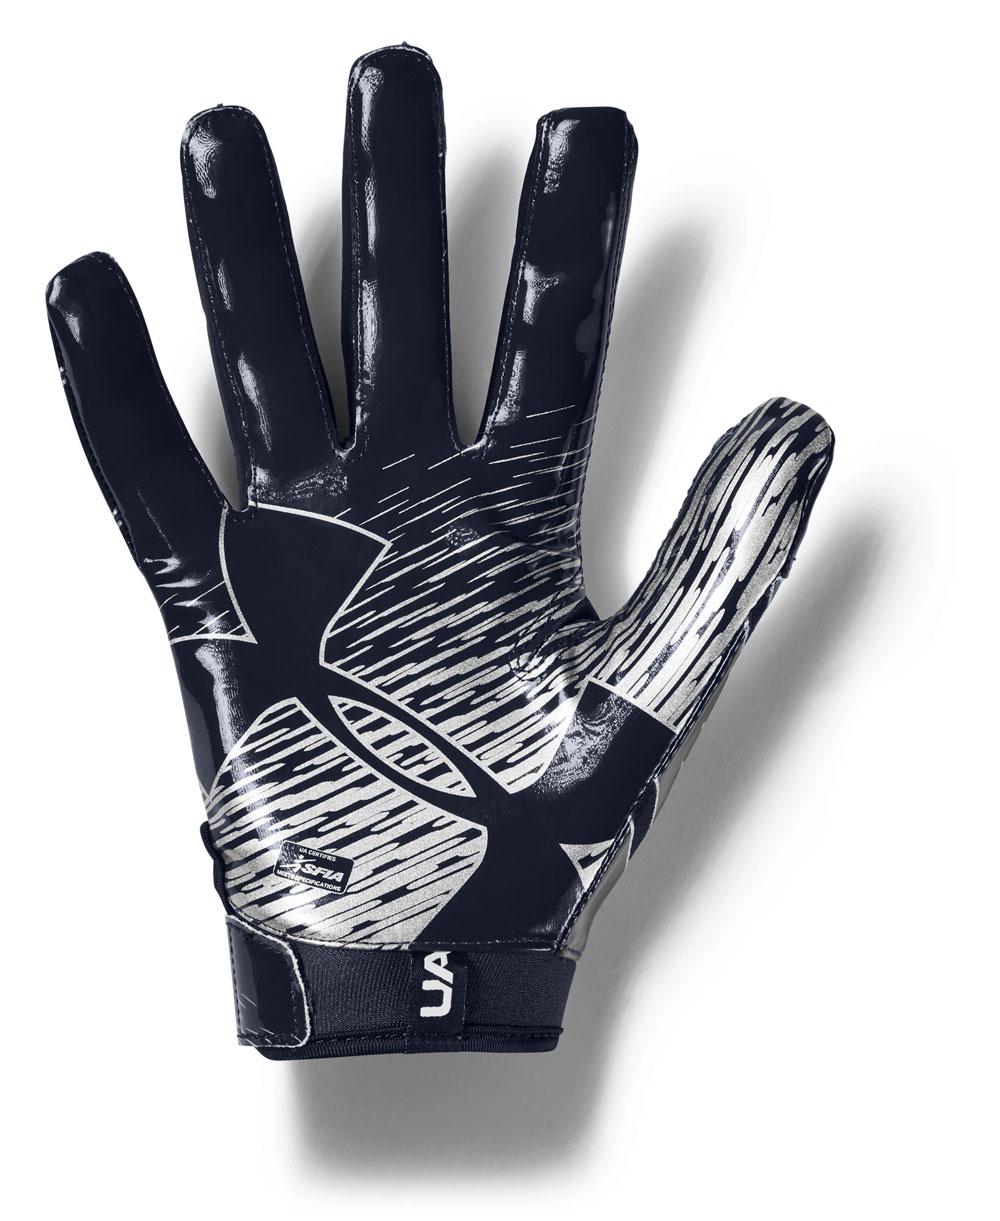 UA F7 Guantes Fútbol Americano para Hombre Midnight Navy/Metallic Silver